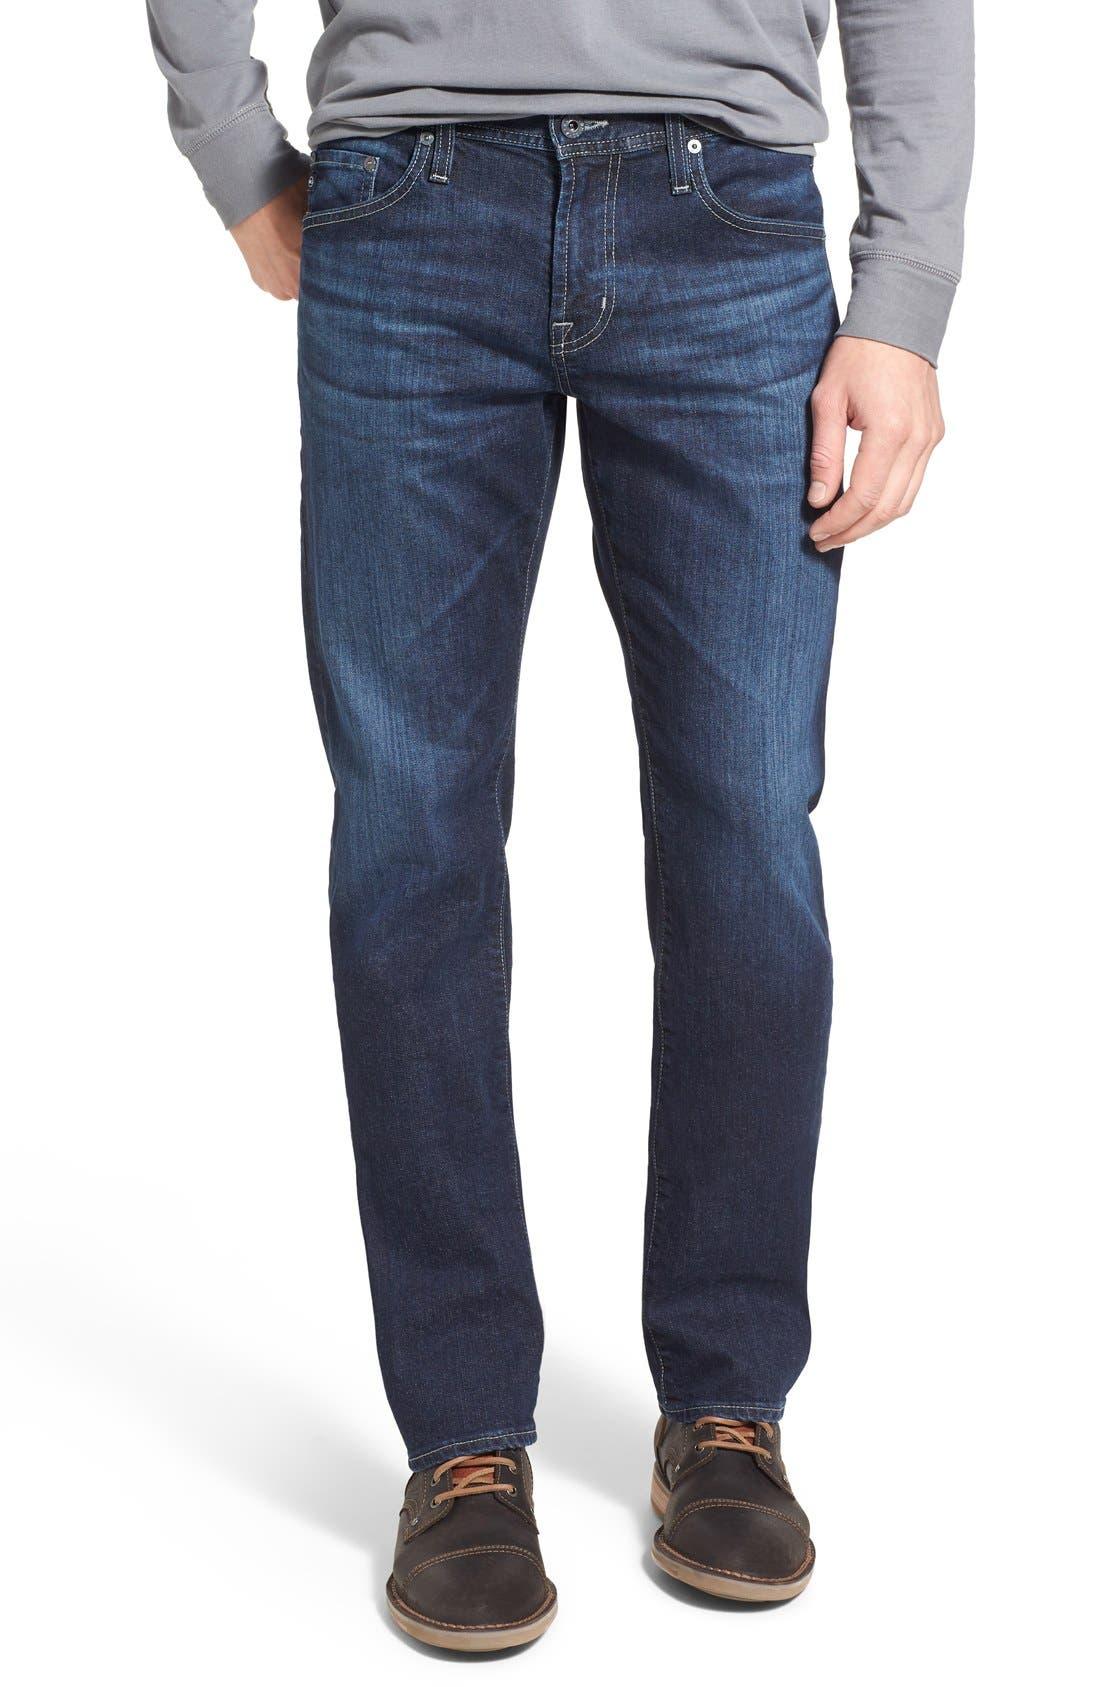 Alternate Image 1 Selected - AG 'Protégé' Straight Leg Jeans (Kingswell)